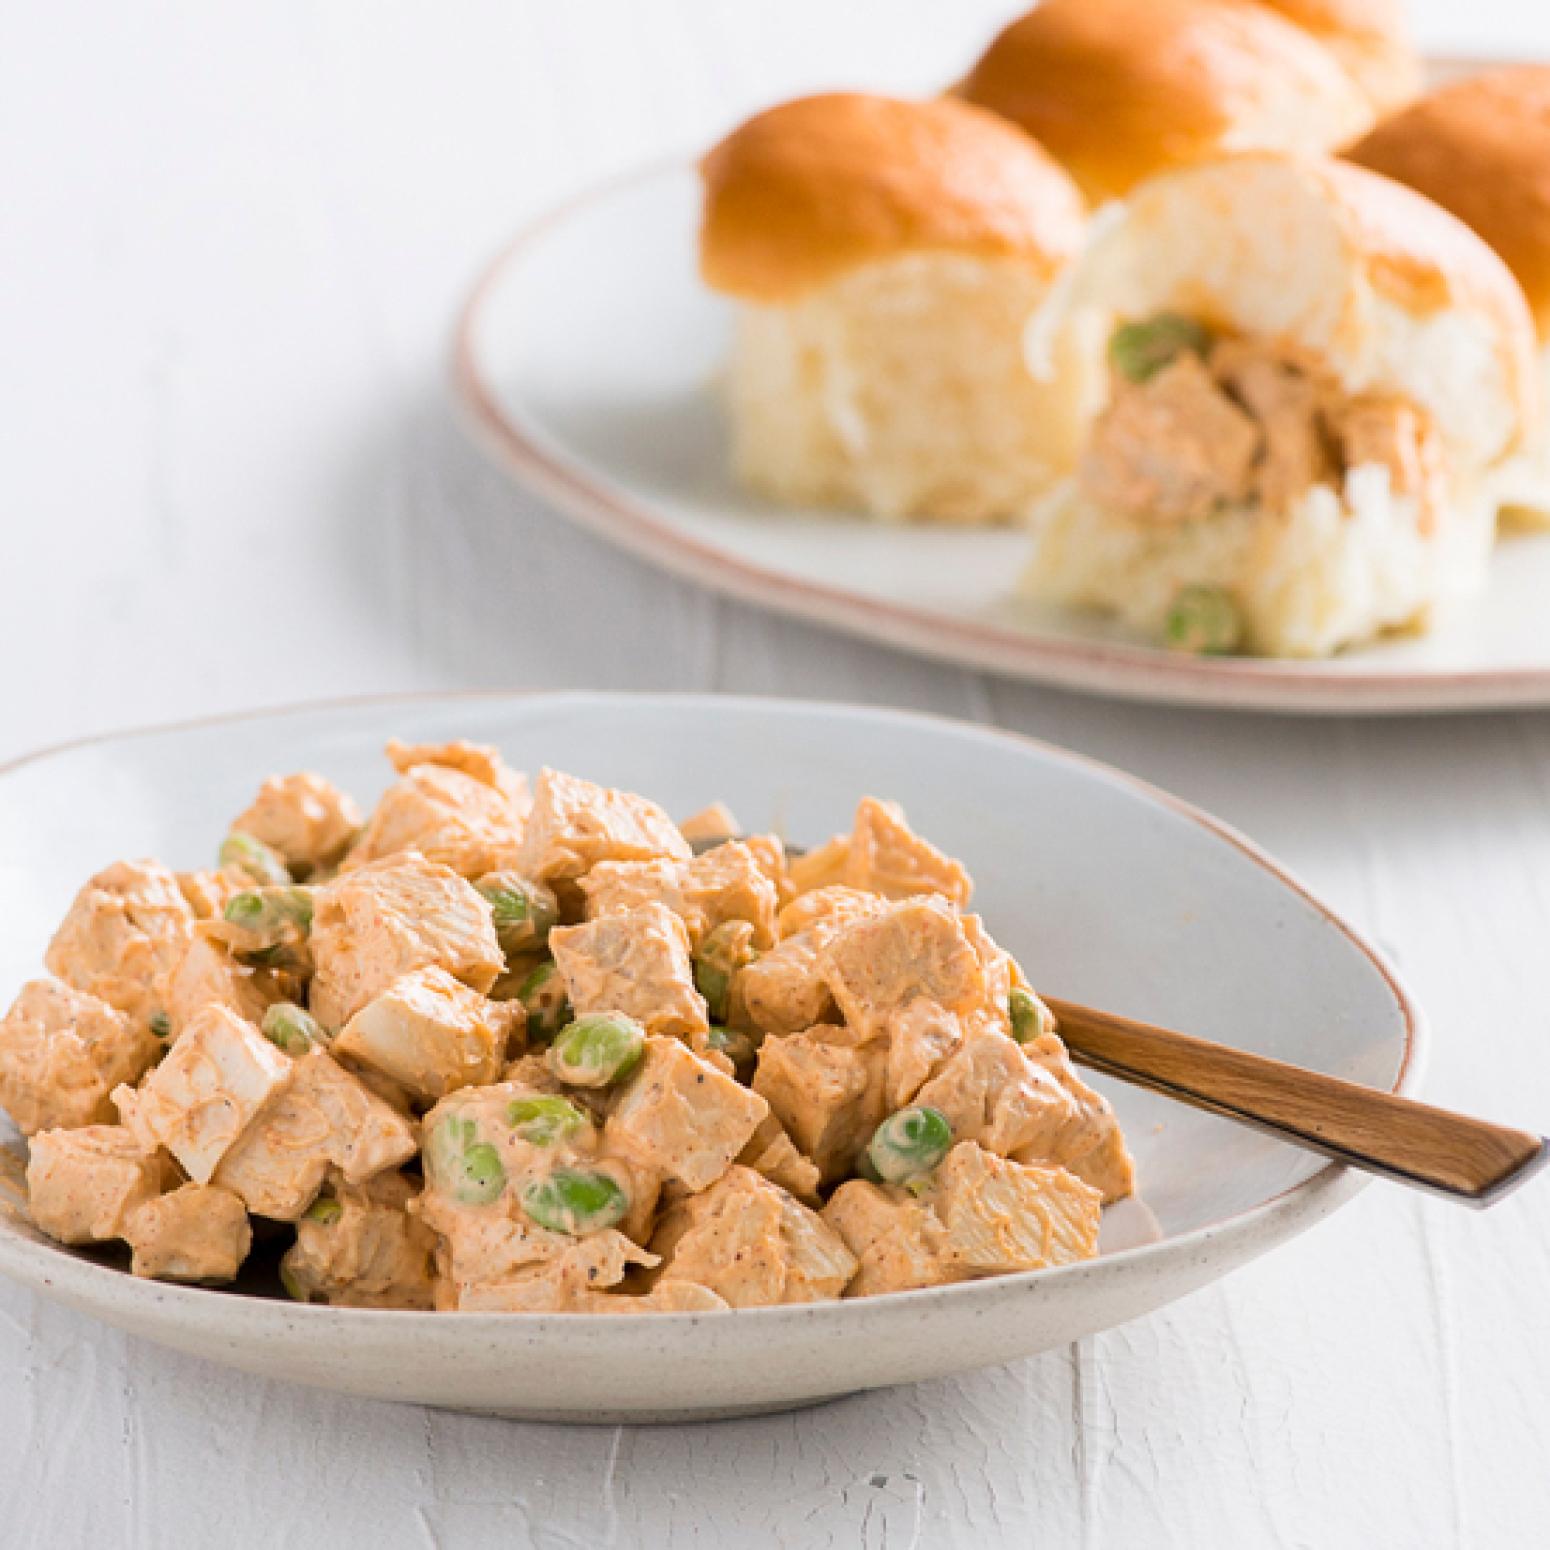 edamame chicken dinner salad recipes dishmaps edamame chicken dinner ...